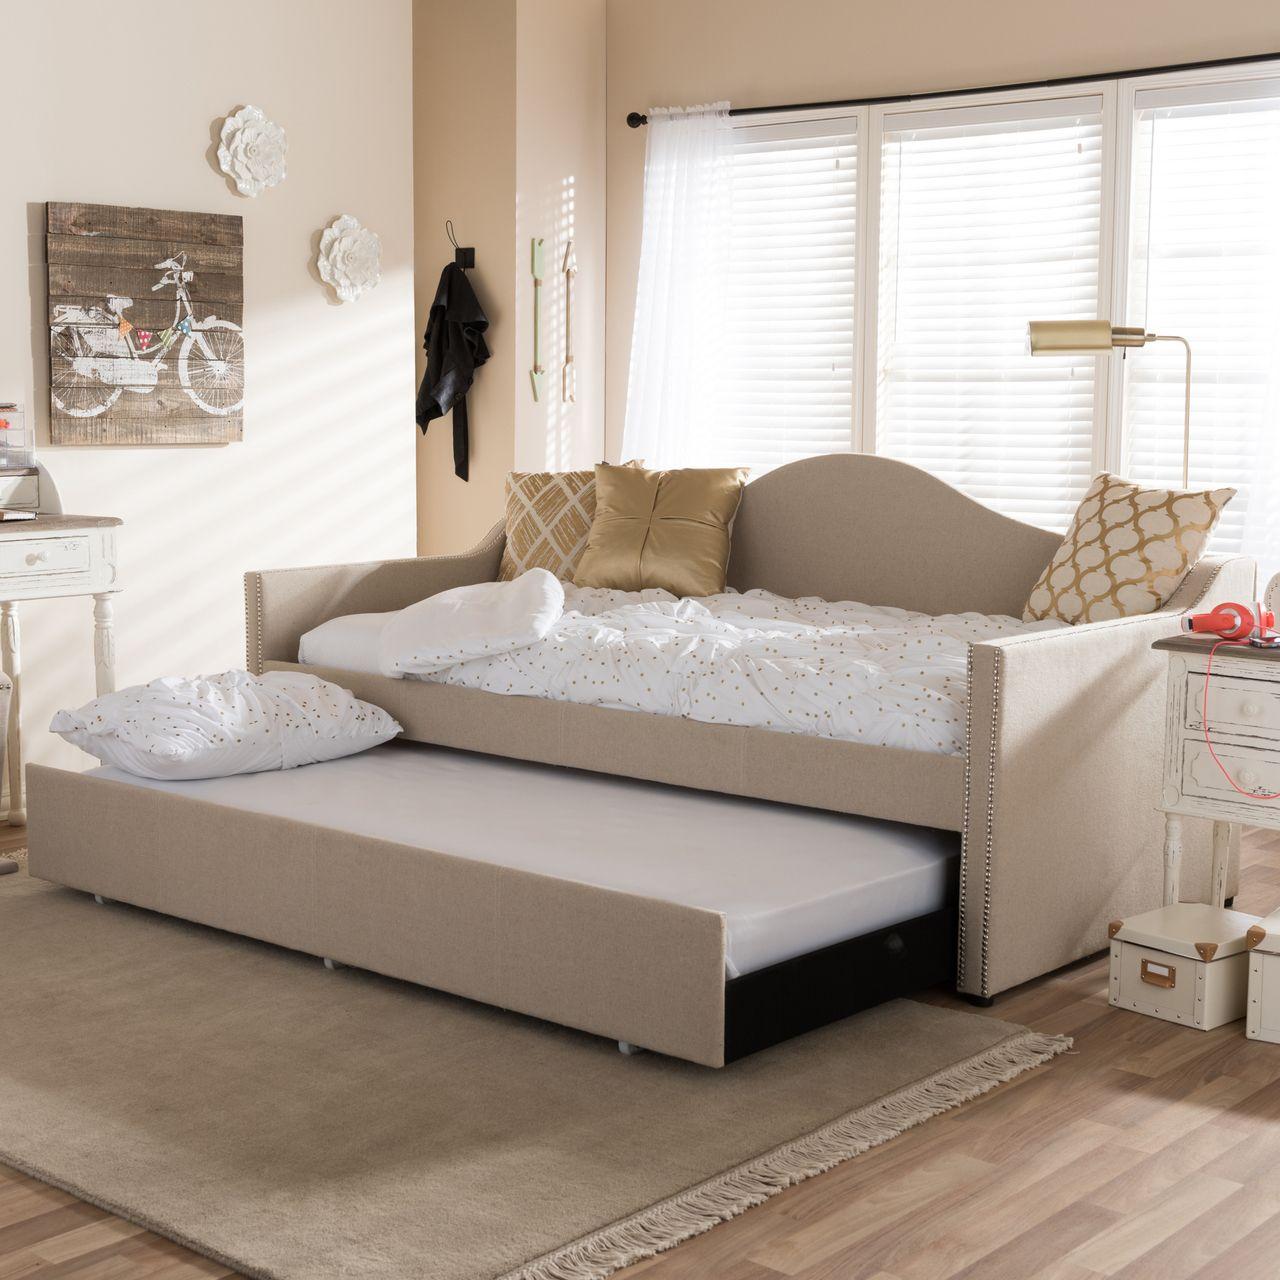 baxton studio prime modern beige linen fabric upholstered arched